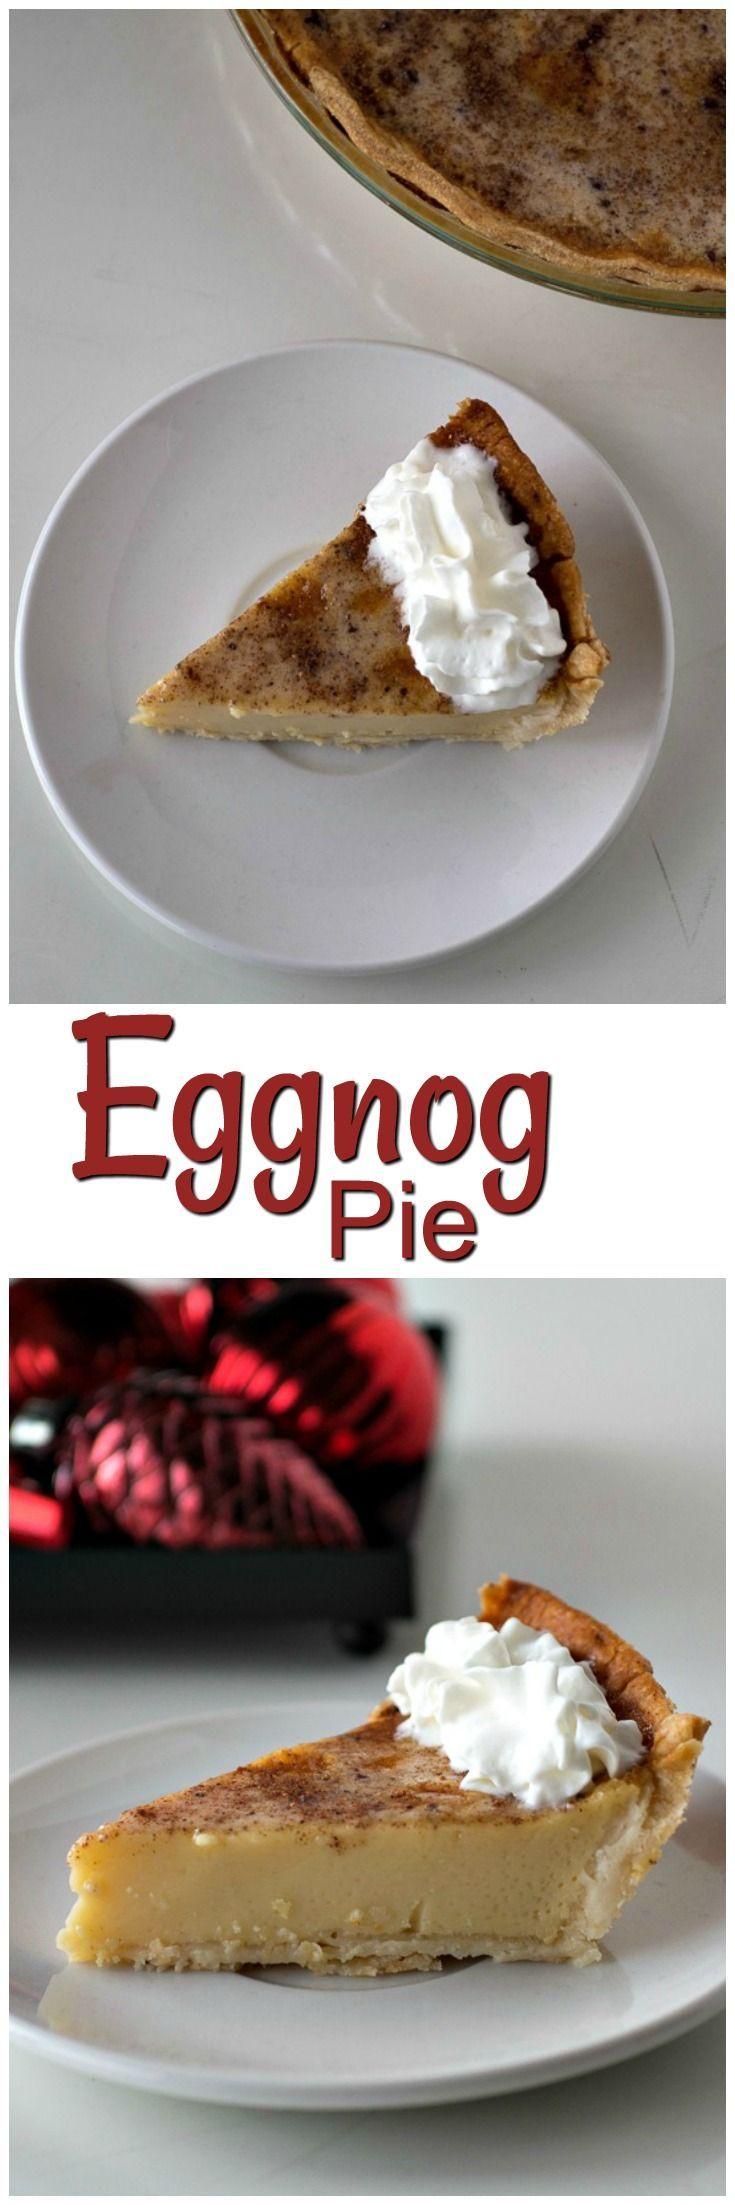 Holiday Eggnog Custard Pie | From Scratch | Eggnog Pie with Rum | Easy and Best Eggnog Pie | Holiday Desserts | Thanksgiving Pie